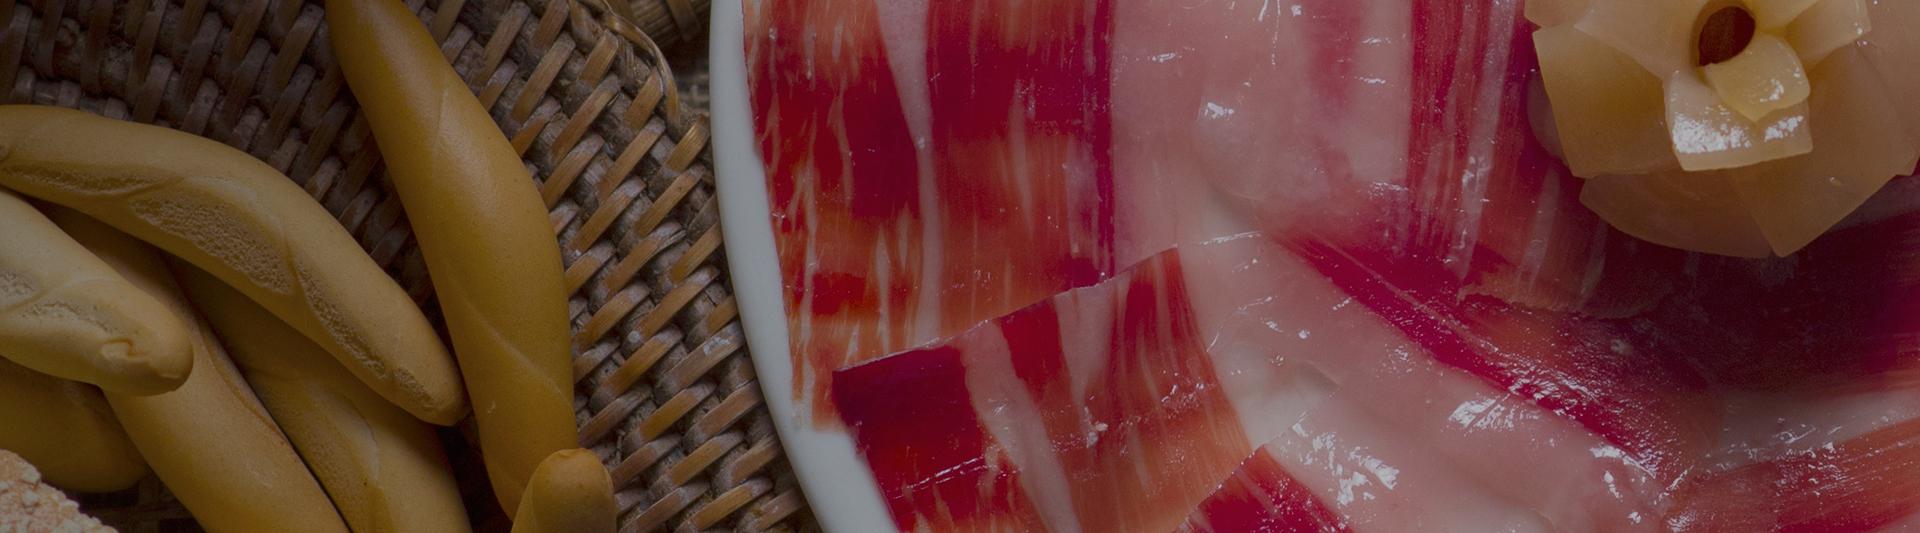 jamón de bellota 100% ibérico bueno para tu salud